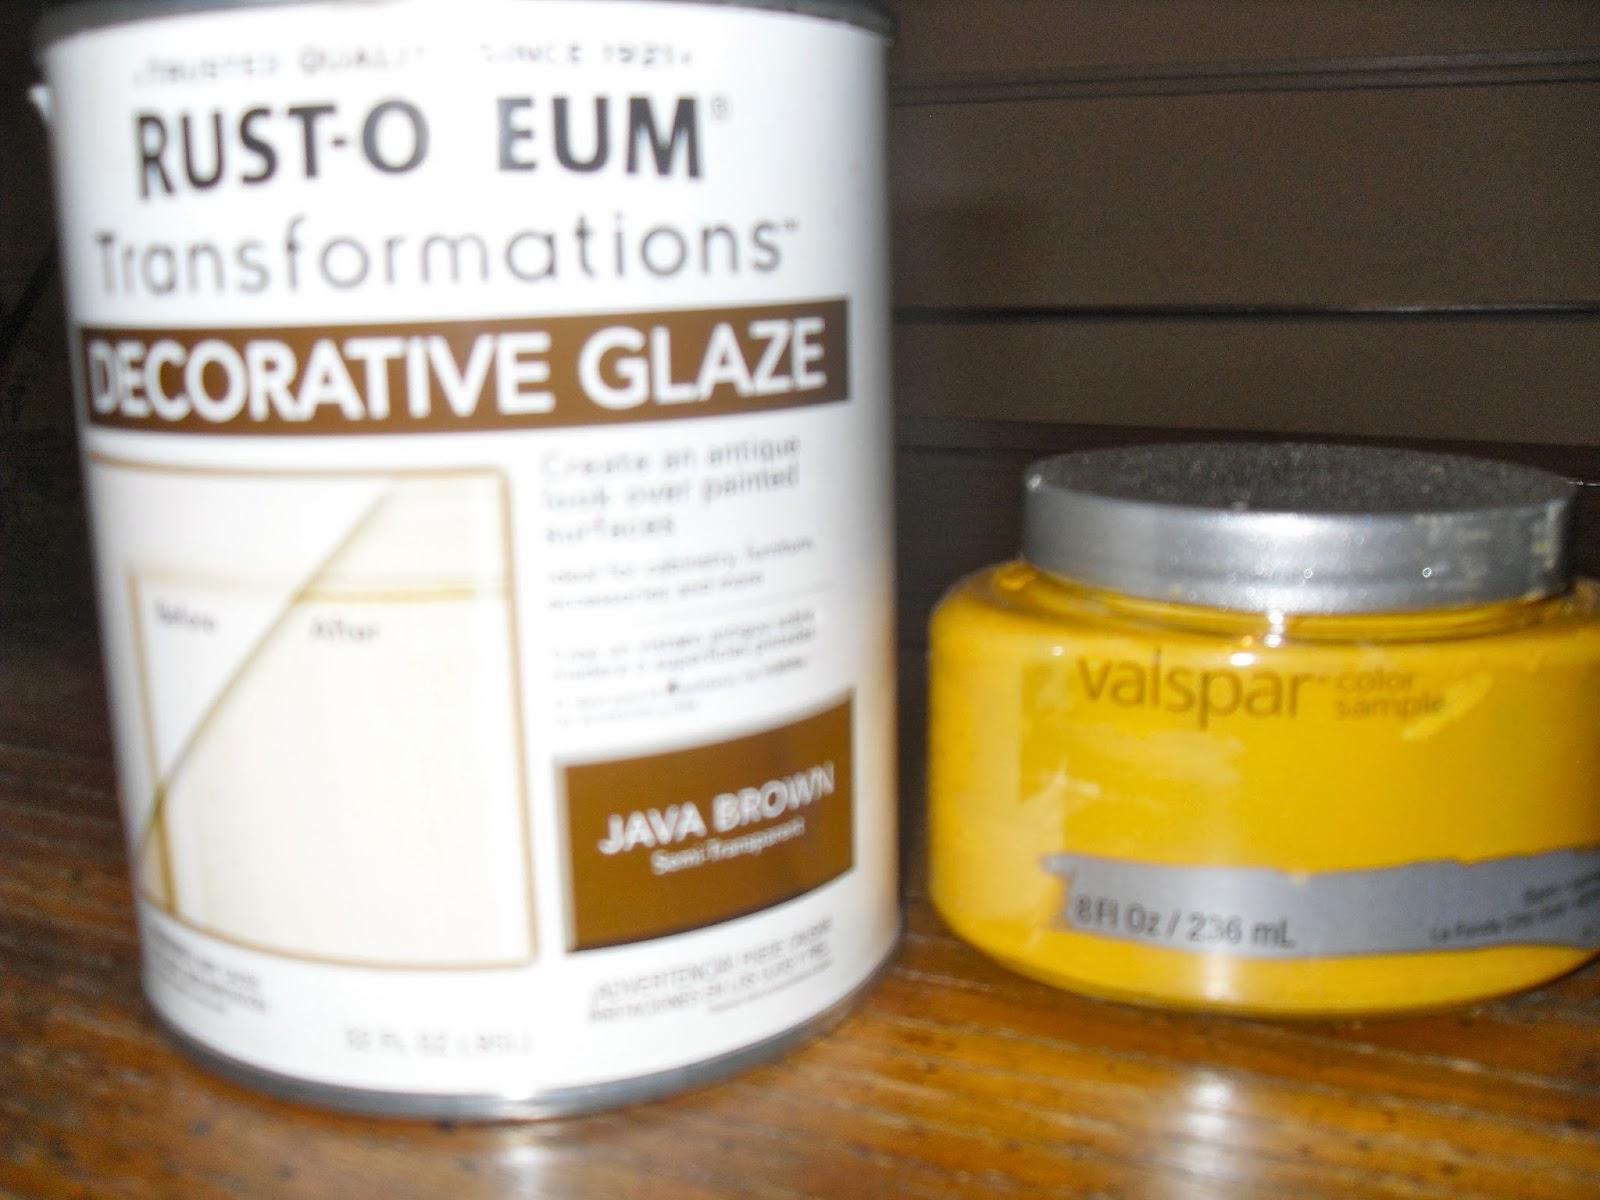 Decorative Glaze Rustoleum Diy Why Spend More Glazing Furniture To Add Depth